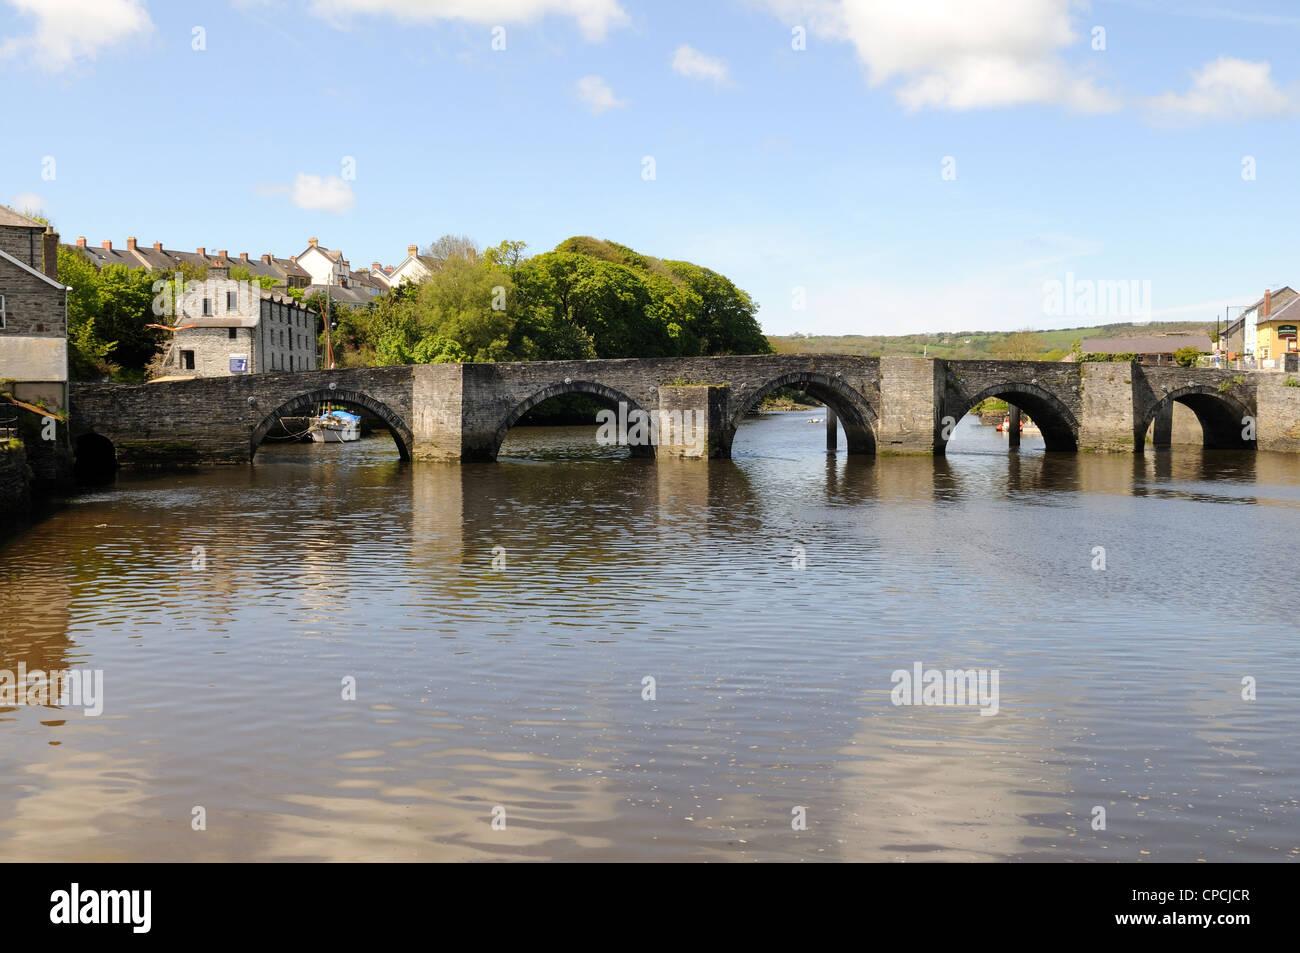 Seven Arch stone  bridge crossing the river Teifi at Cardigan town Abertefi Wales Cymru UK GB Stock Photo